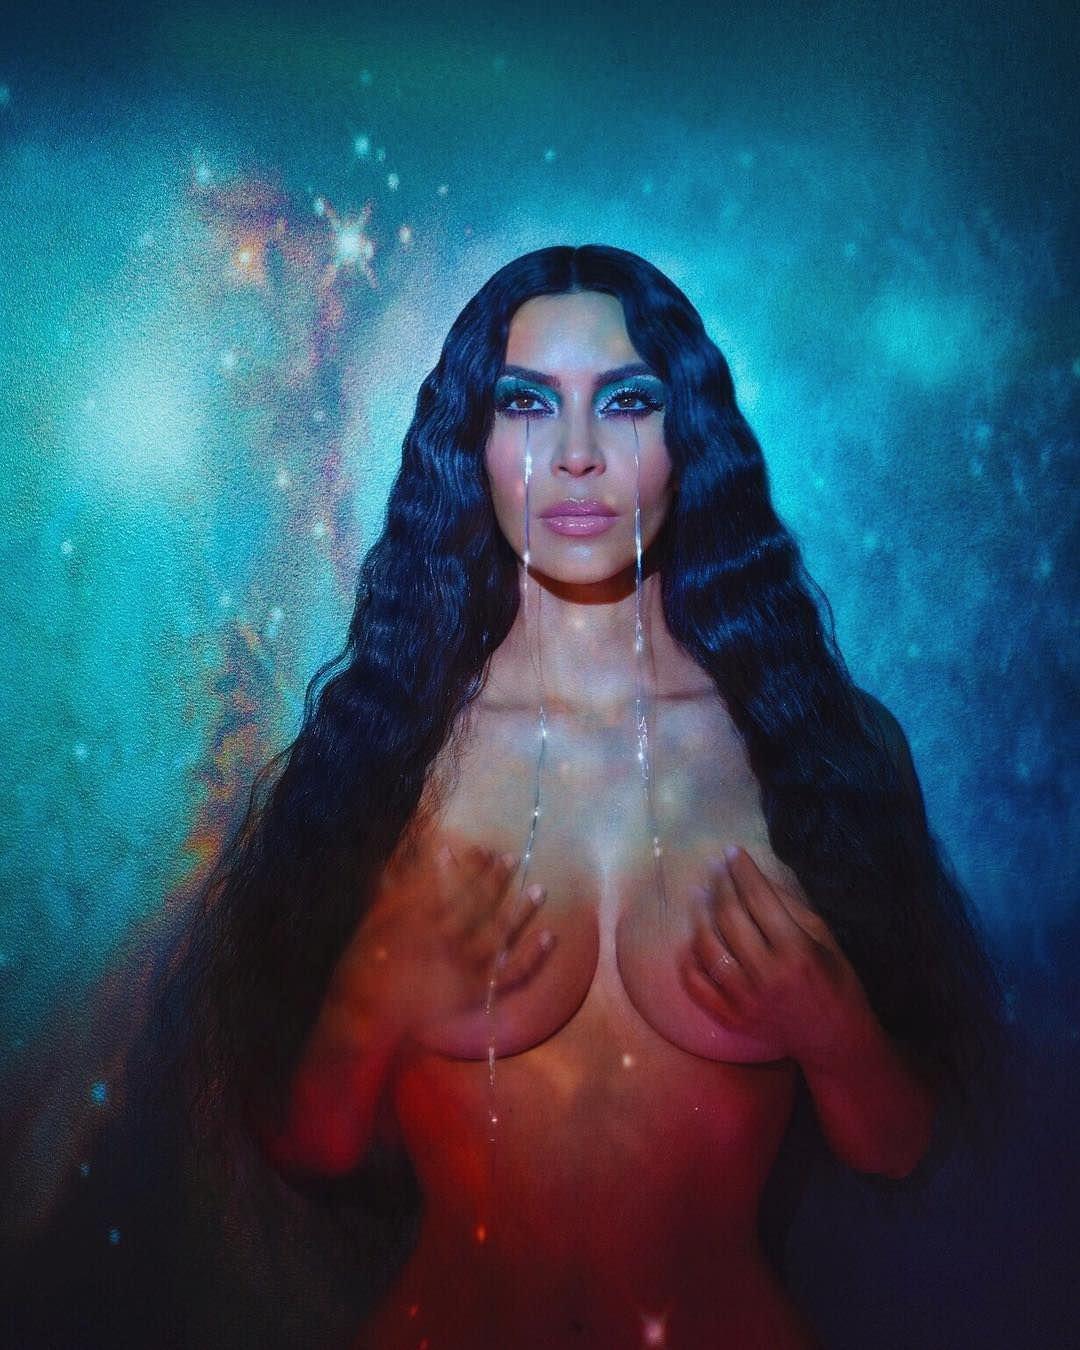 Ким Кардашян фотос распущенными волосами